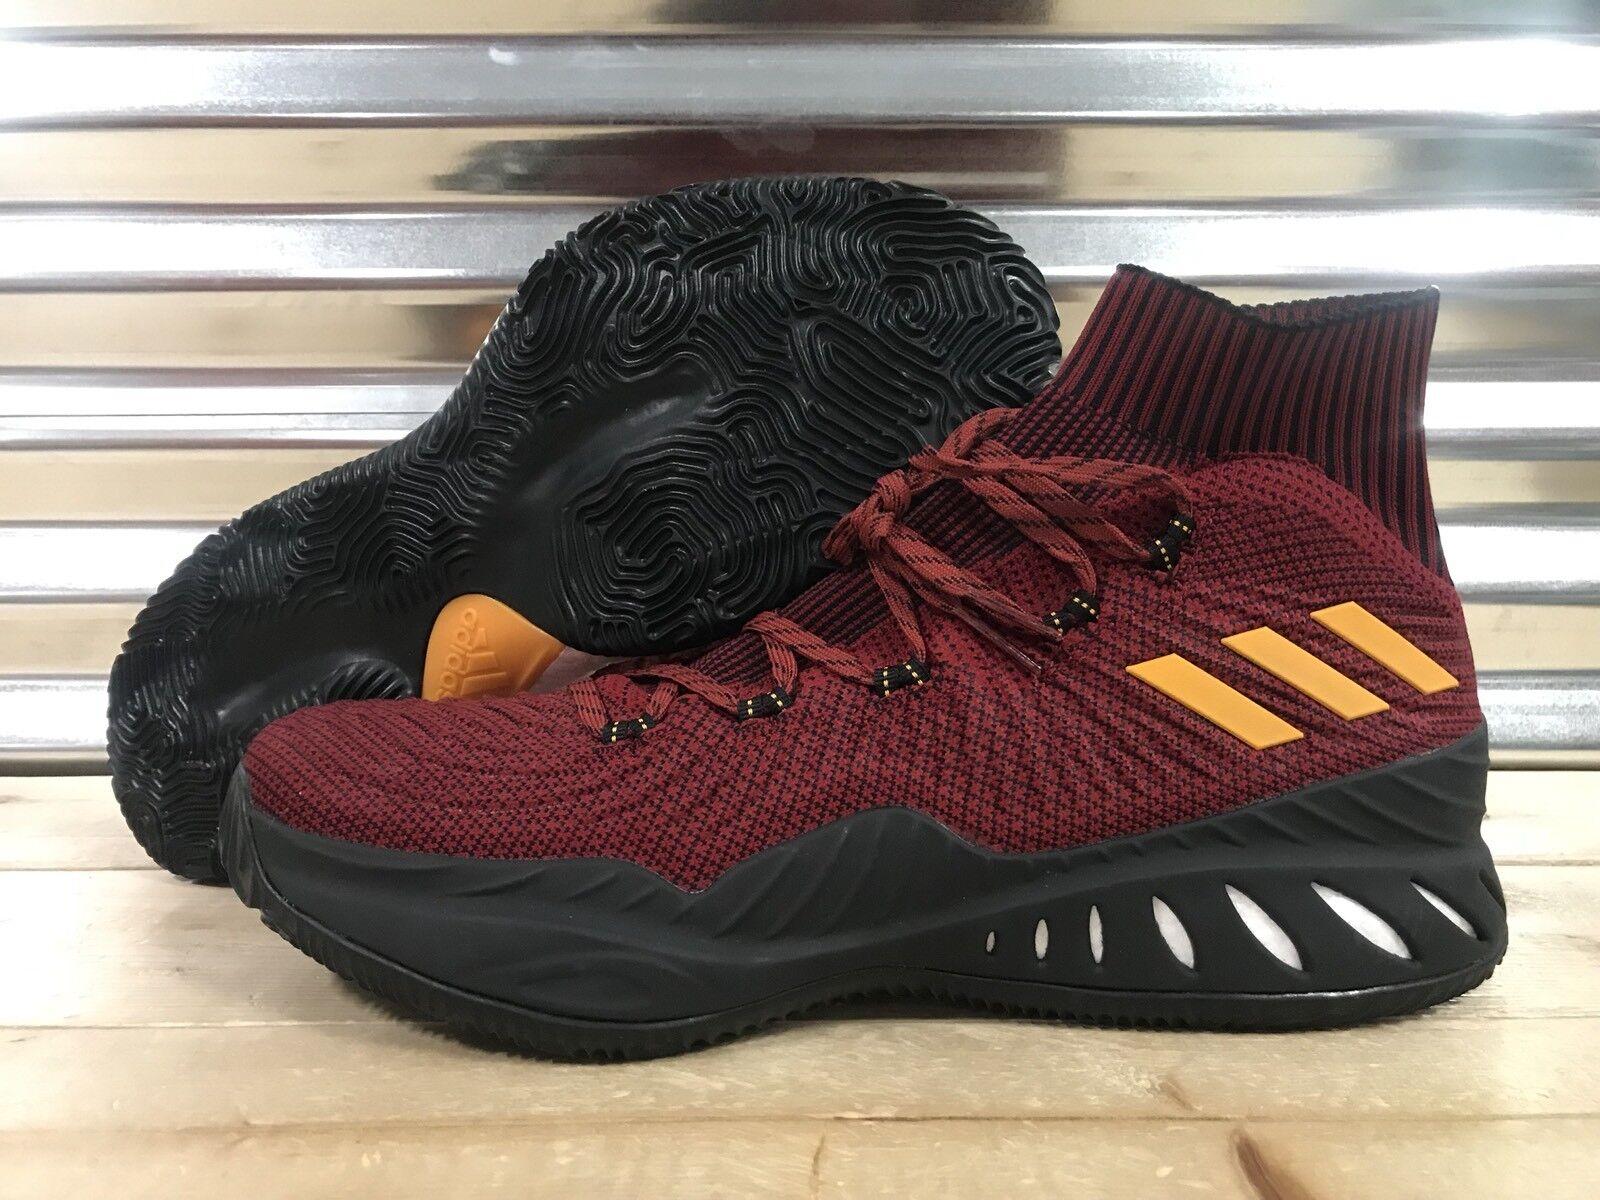 Adidas Crazy Explosive PrimeKnit Justise Winslow PE Miami Heat SZ 14 ( AH2368 )